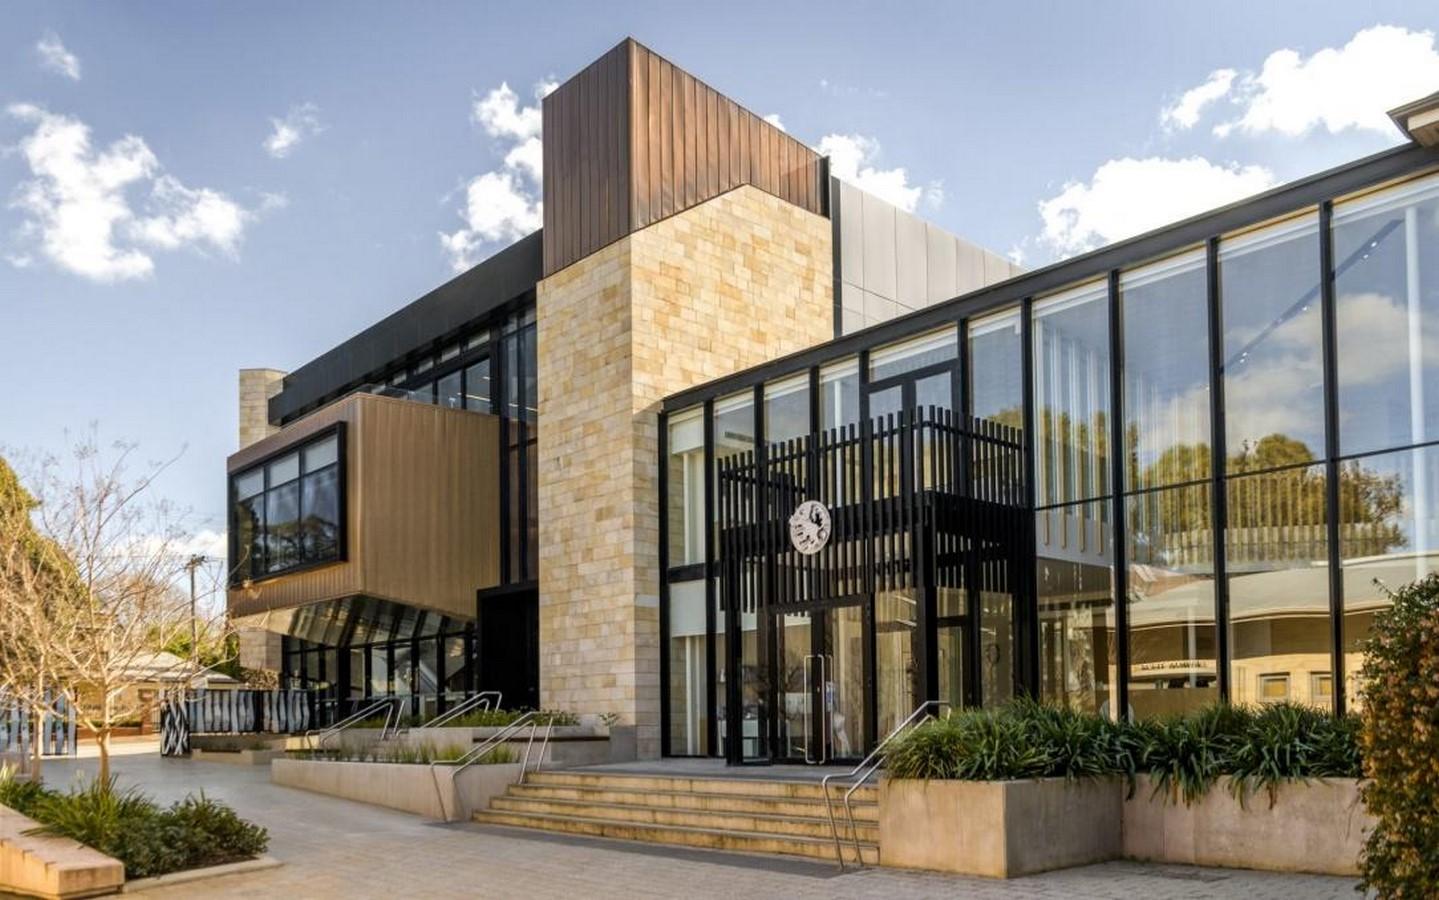 The NSW Cricket Centre